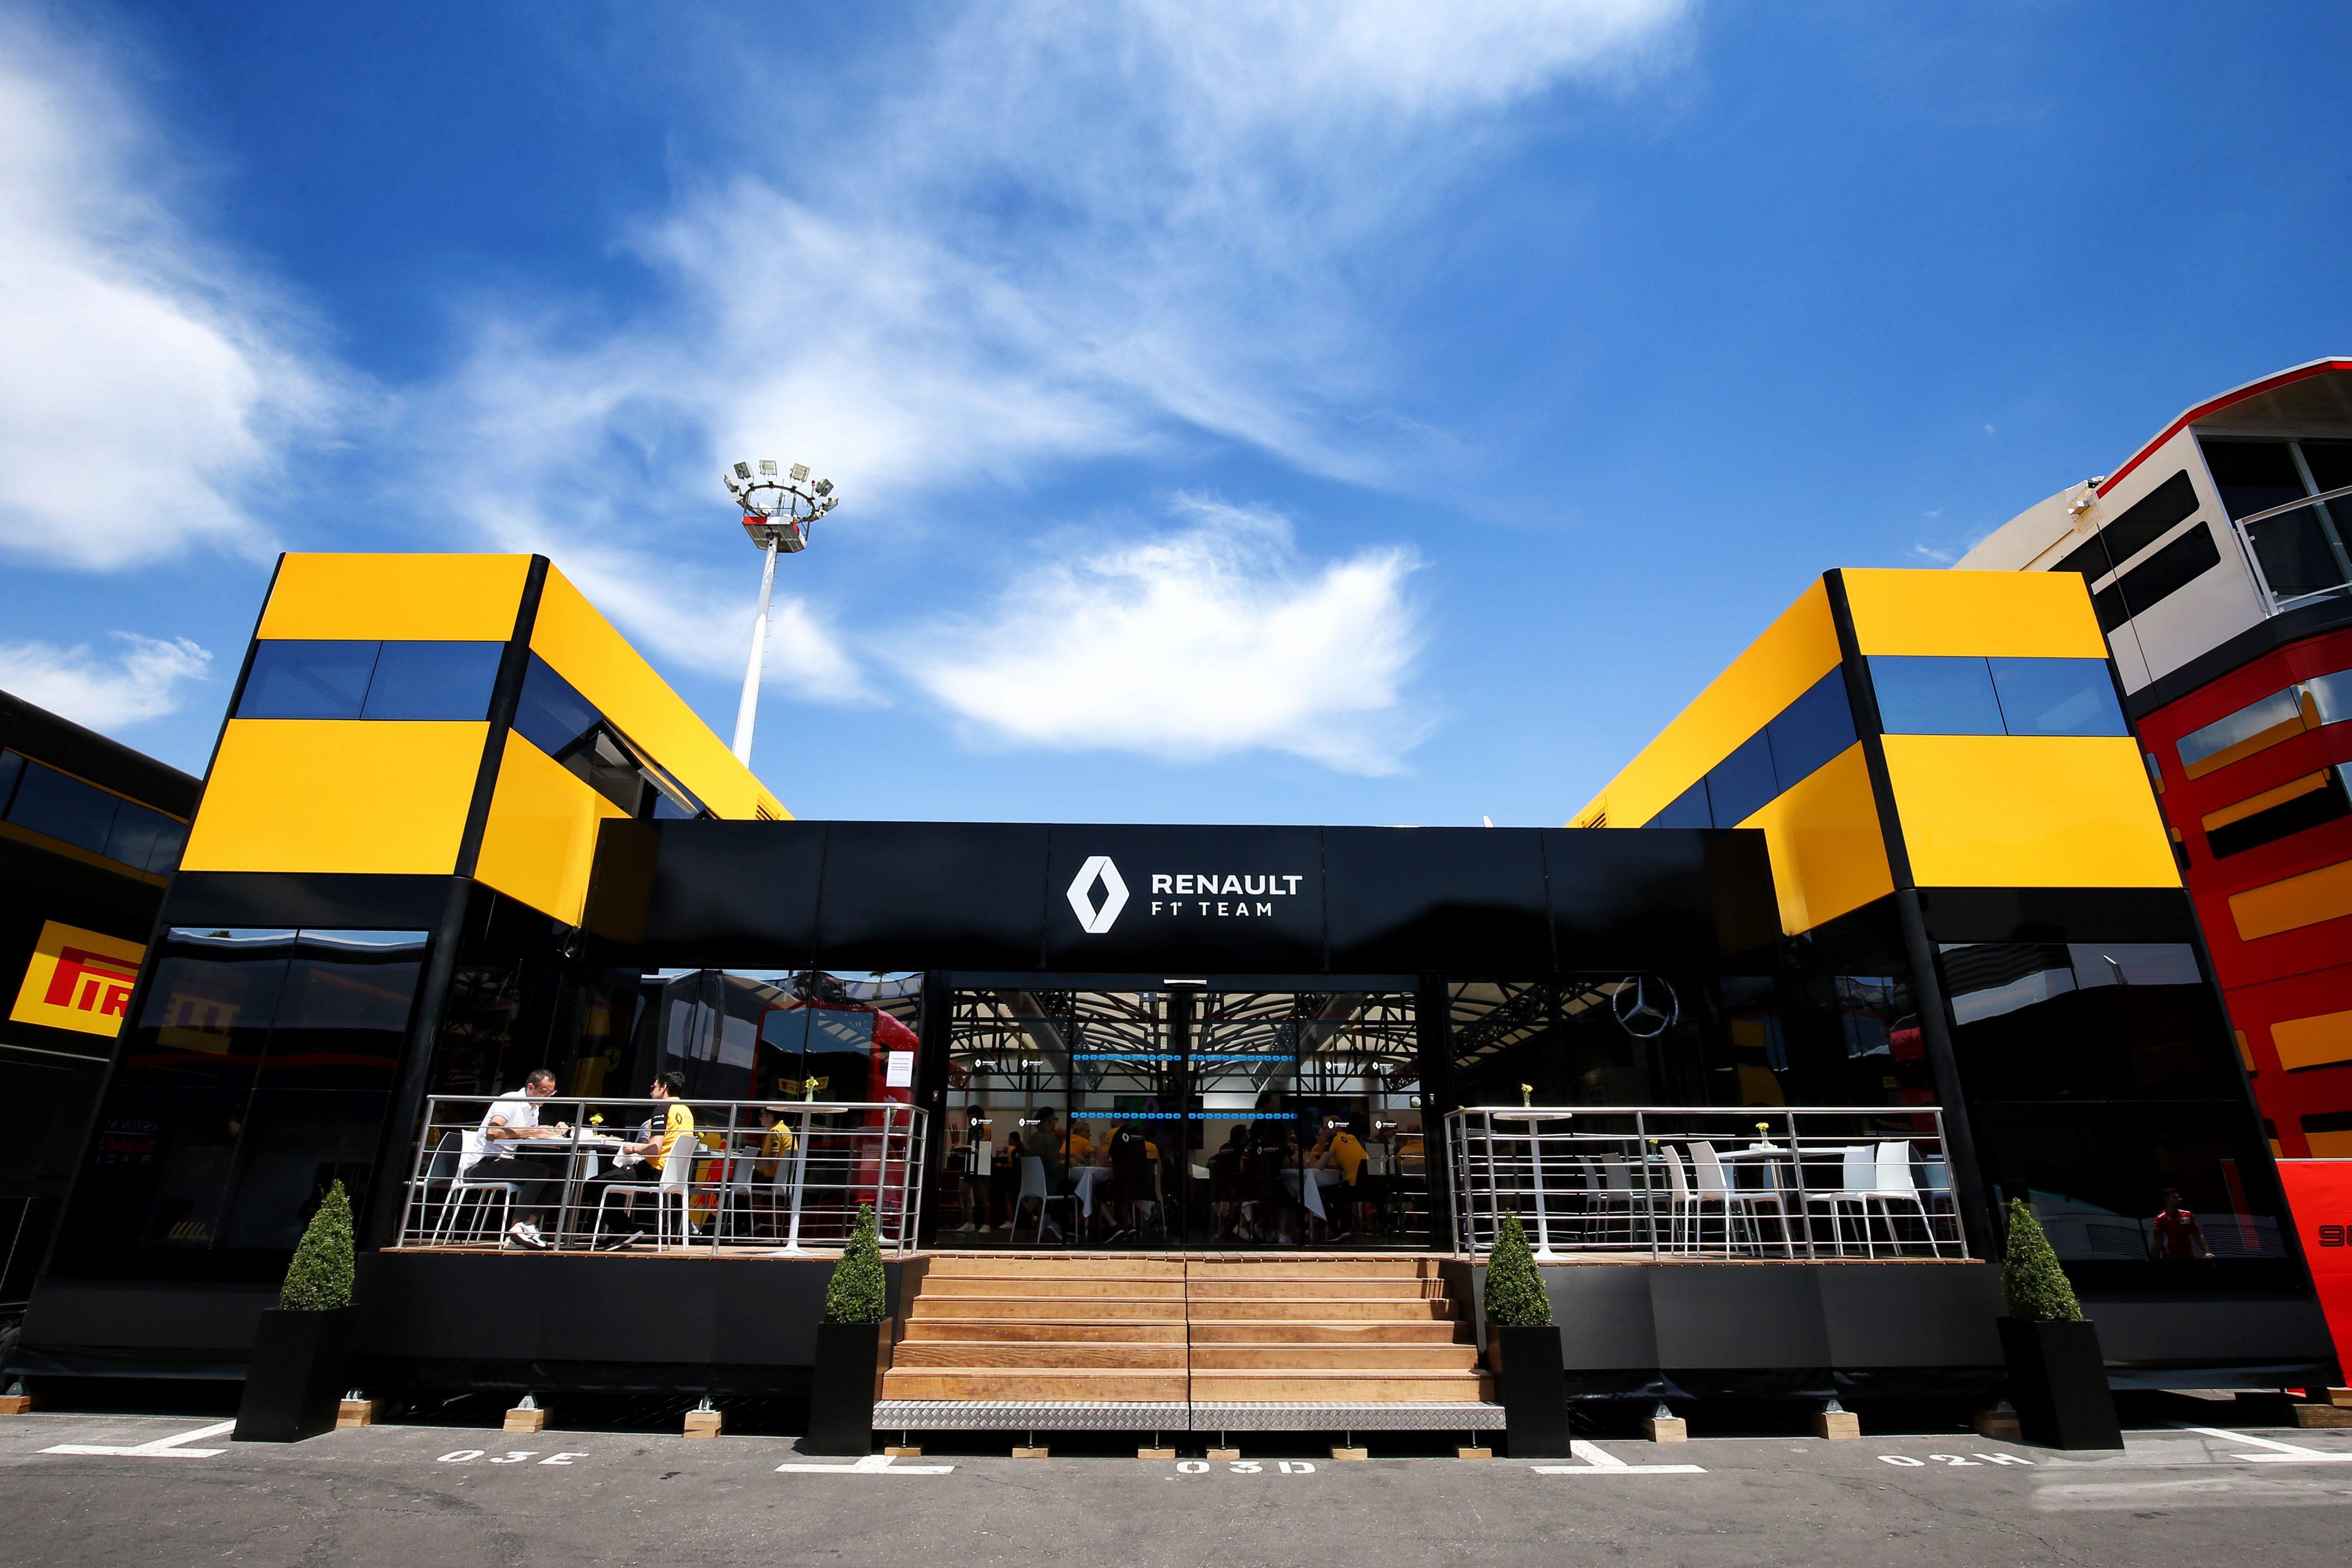 Renault motorhome F1